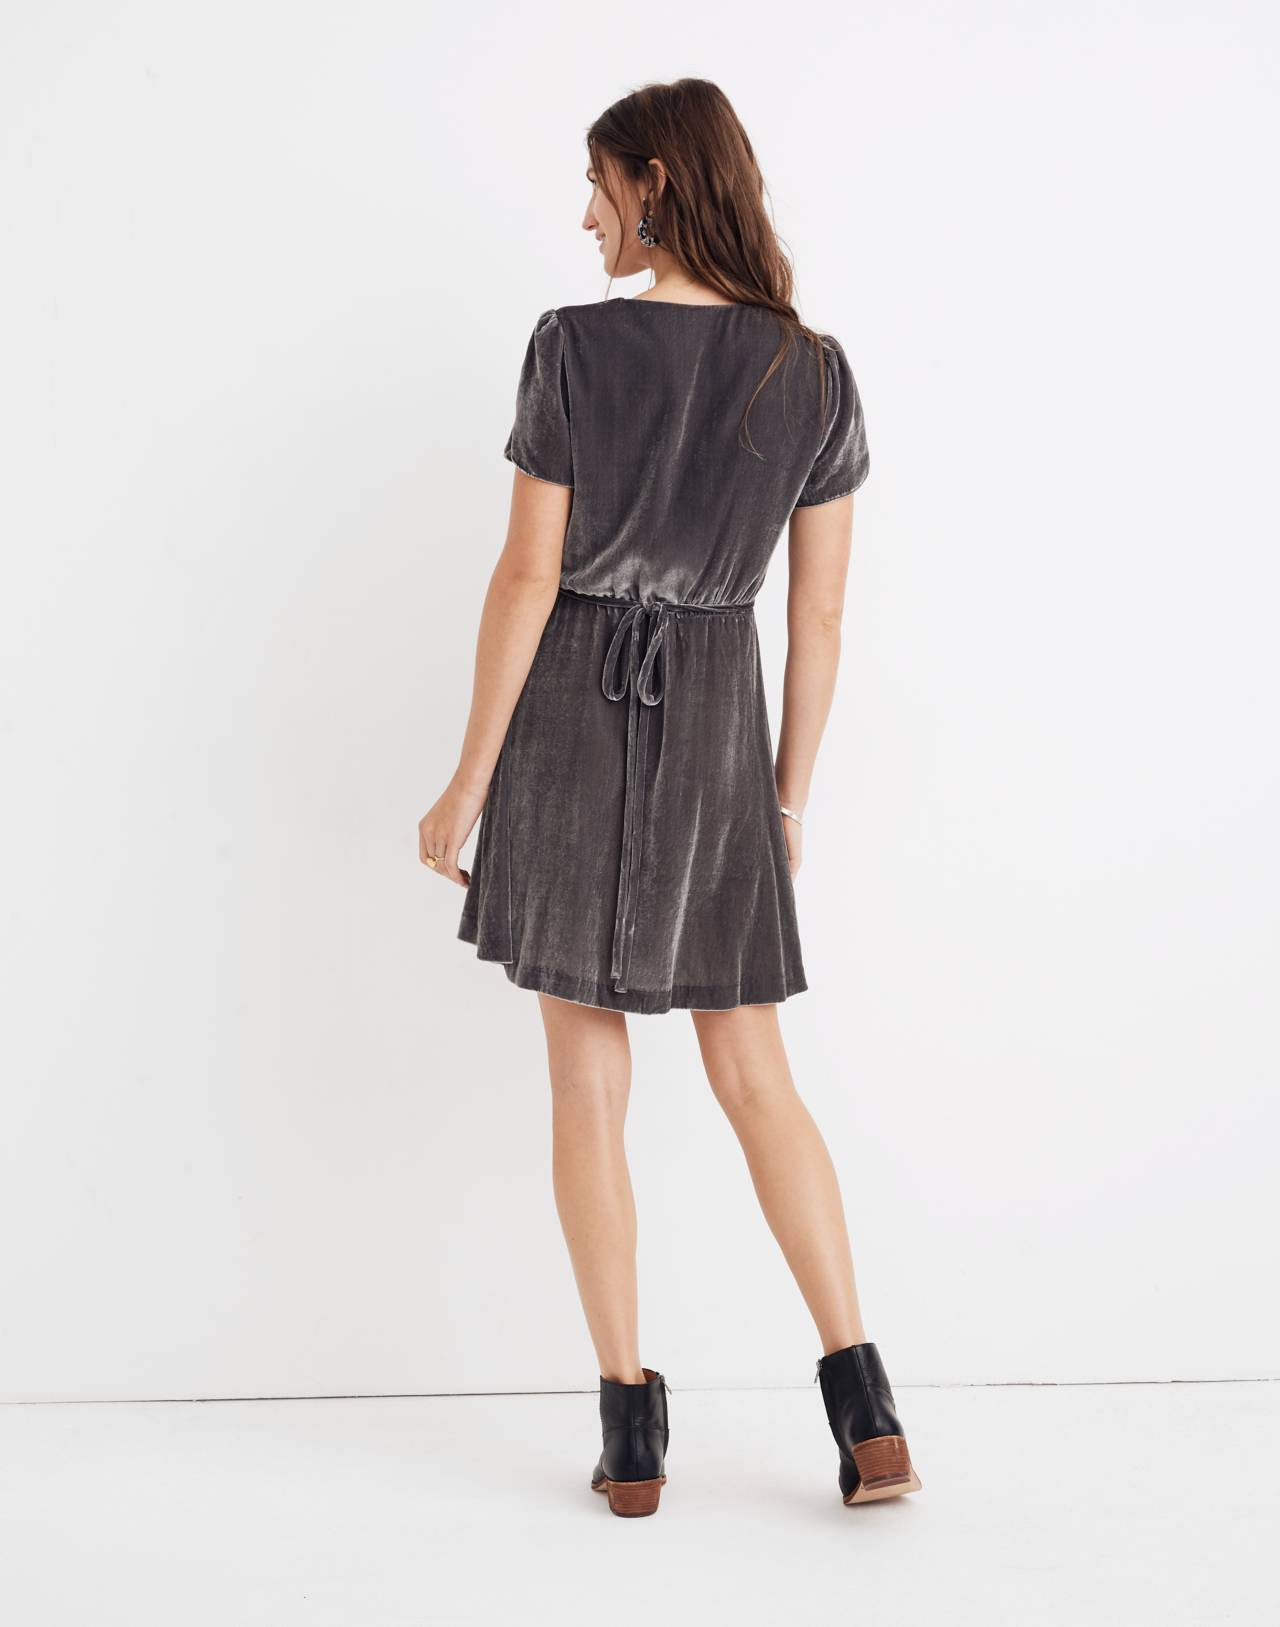 Velvet Wrap Dress in smoked graphite image 3